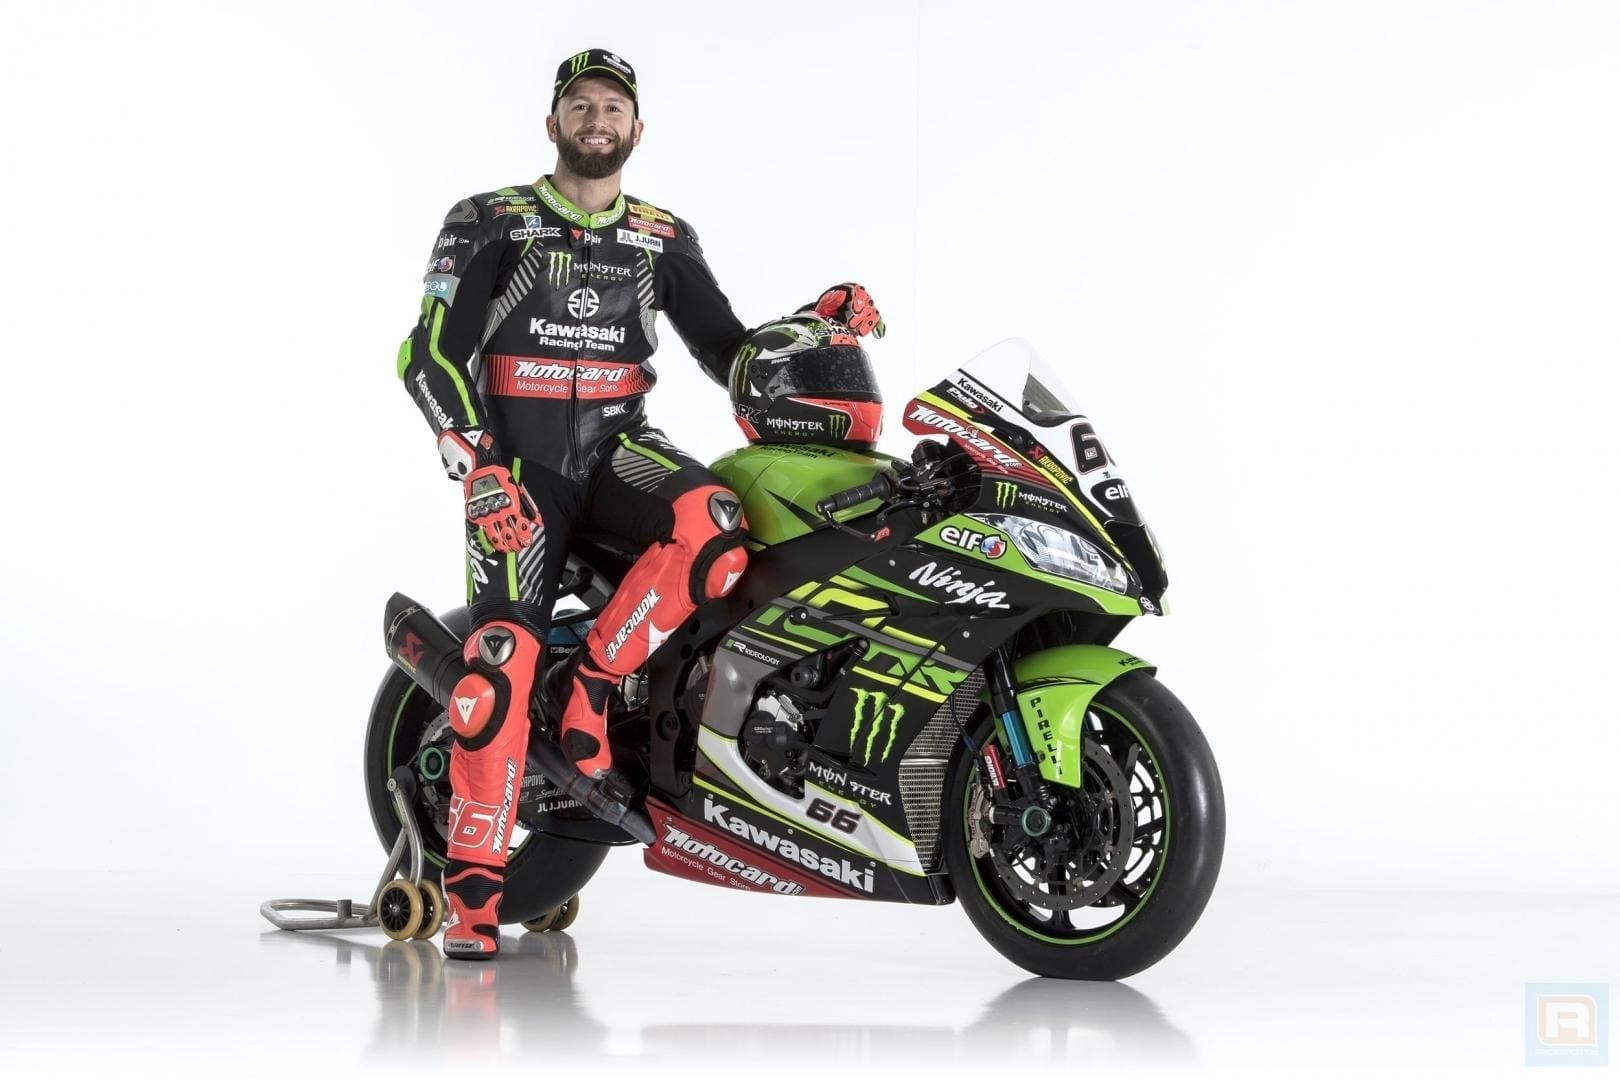 Tom_Sykes_ZX-10RR - Racesport.nl